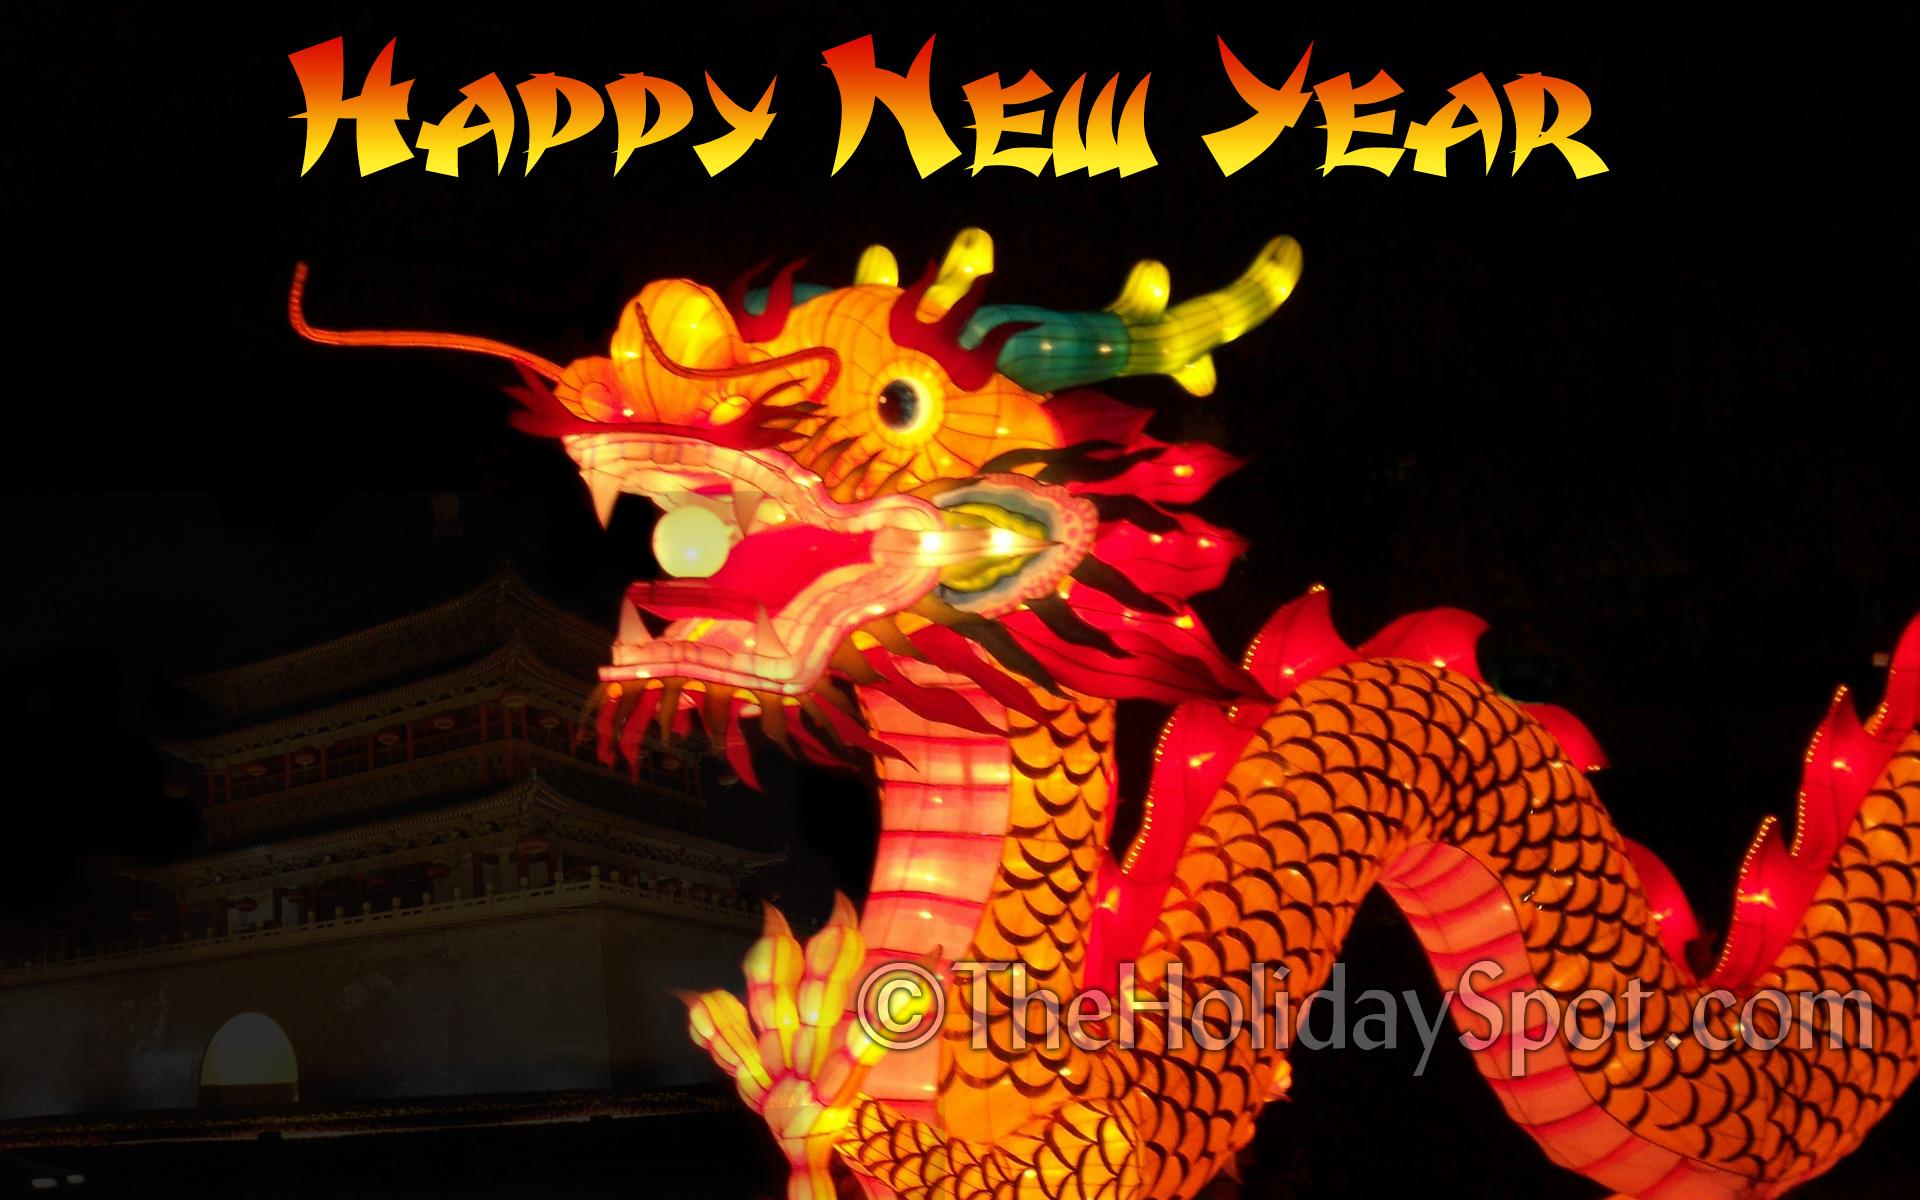 chinese new year wallpapers at theholidayspot